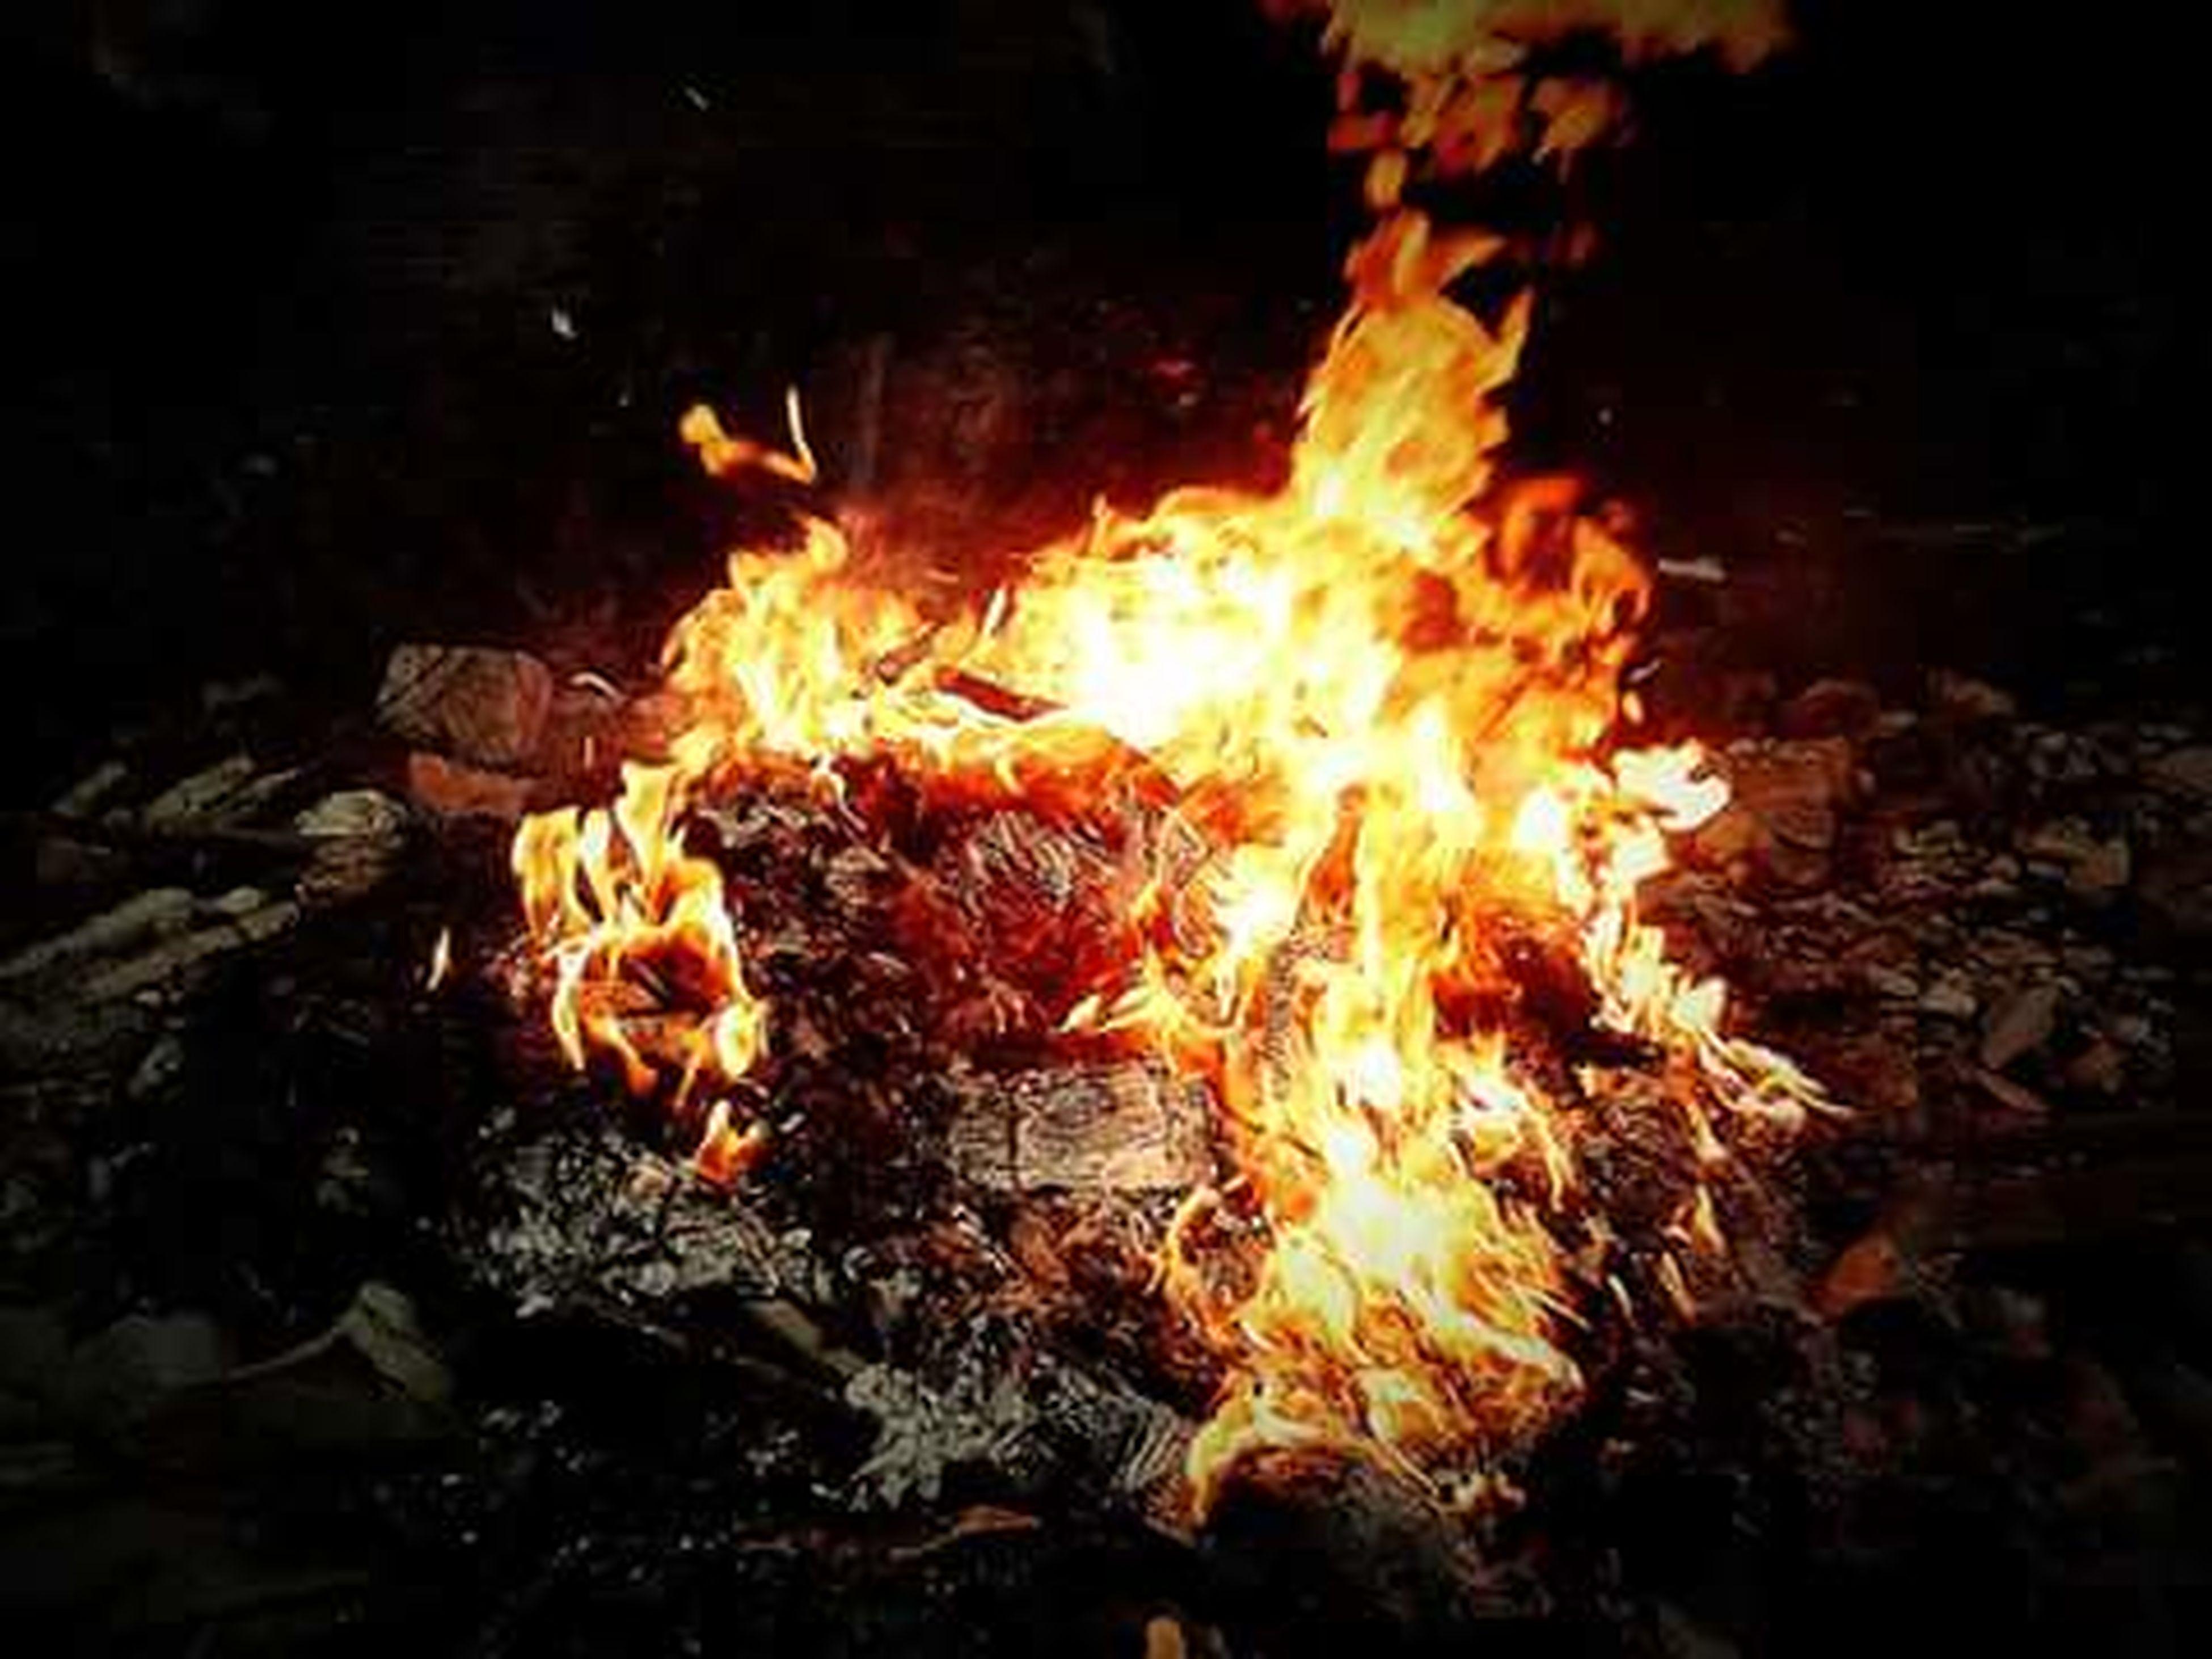 burning, flame, fire - natural phenomenon, heat - temperature, glowing, bonfire, firewood, night, fire, campfire, motion, heat, close-up, long exposure, orange color, wood - material, dark, log, no people, light - natural phenomenon